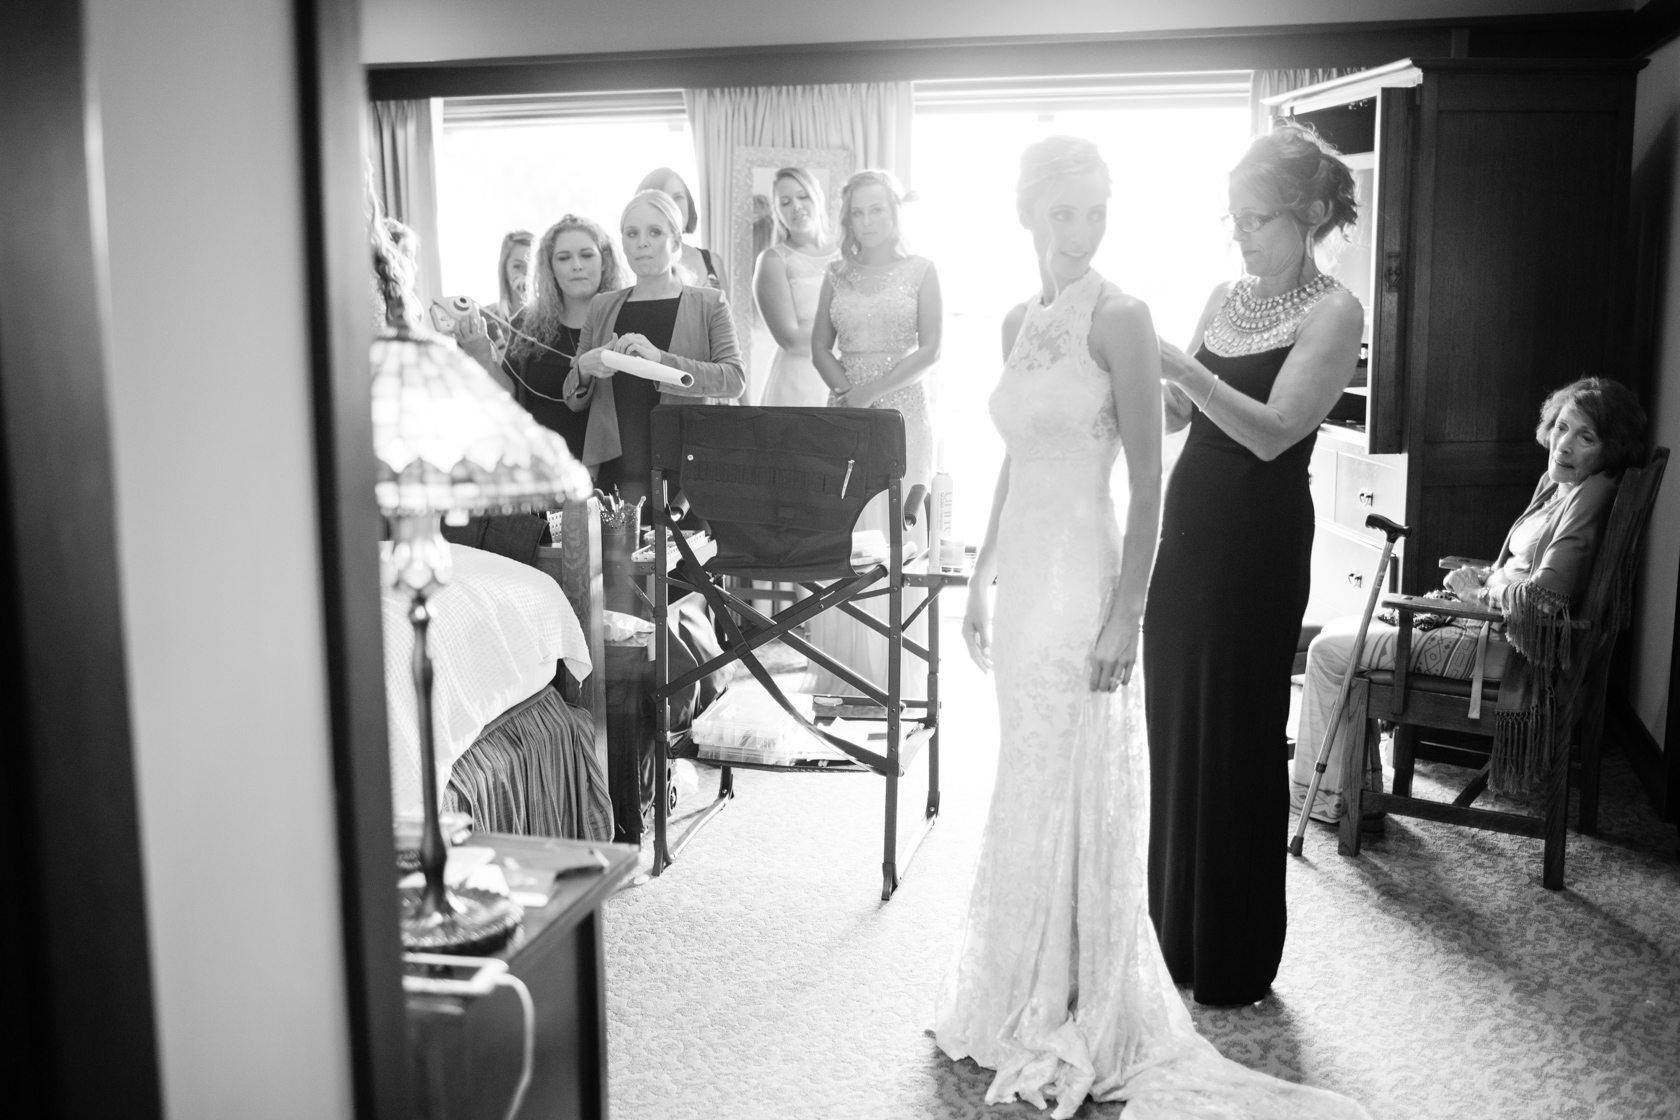 The_Lodge_at_Torrey_Pines_Wedding_019.jpg